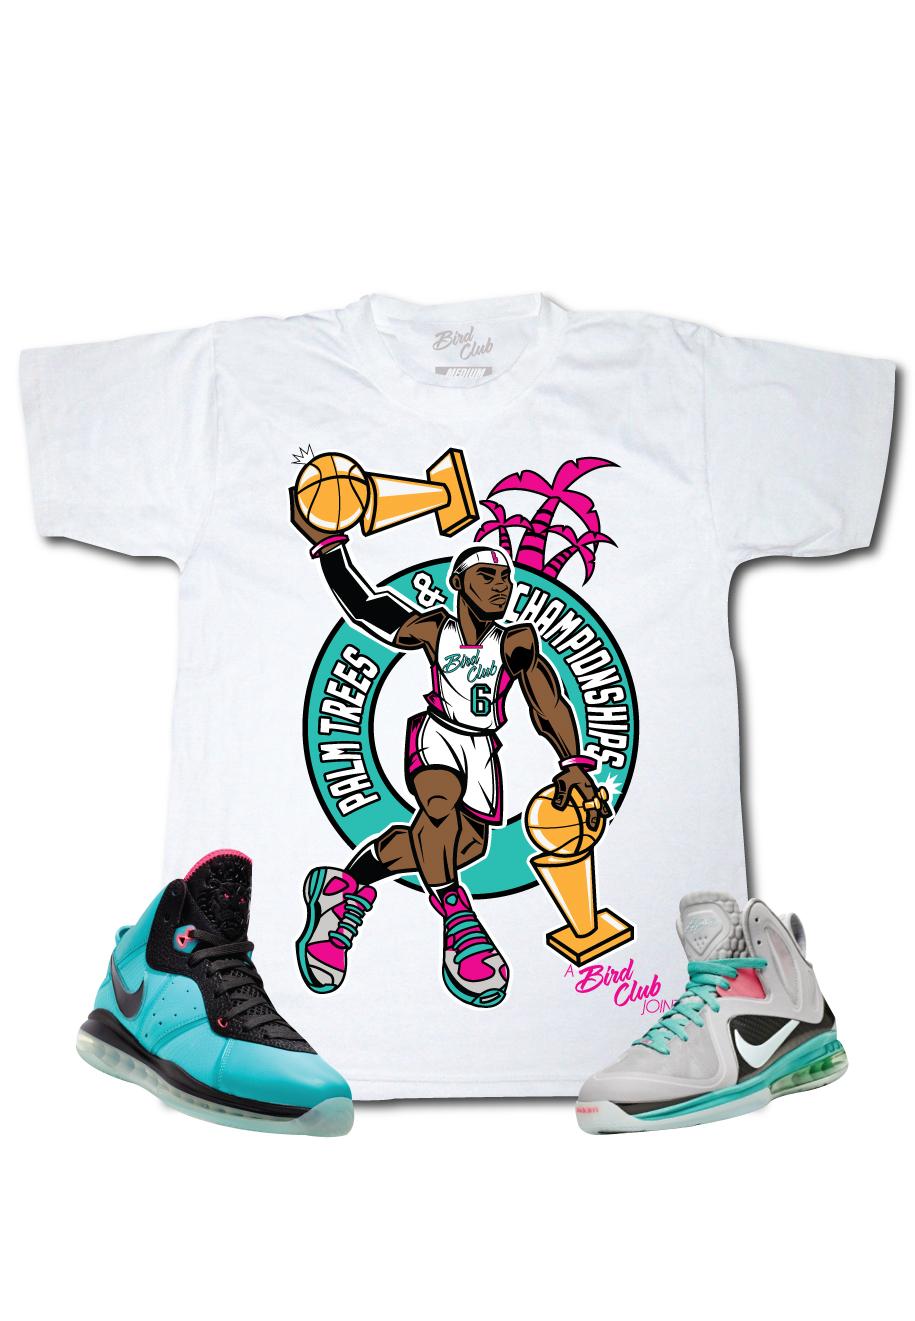 c9db44e660ddf8 Lebron 9 Miami Vice South Beach Shoes   Bird Club Clothing T-Shirt ...